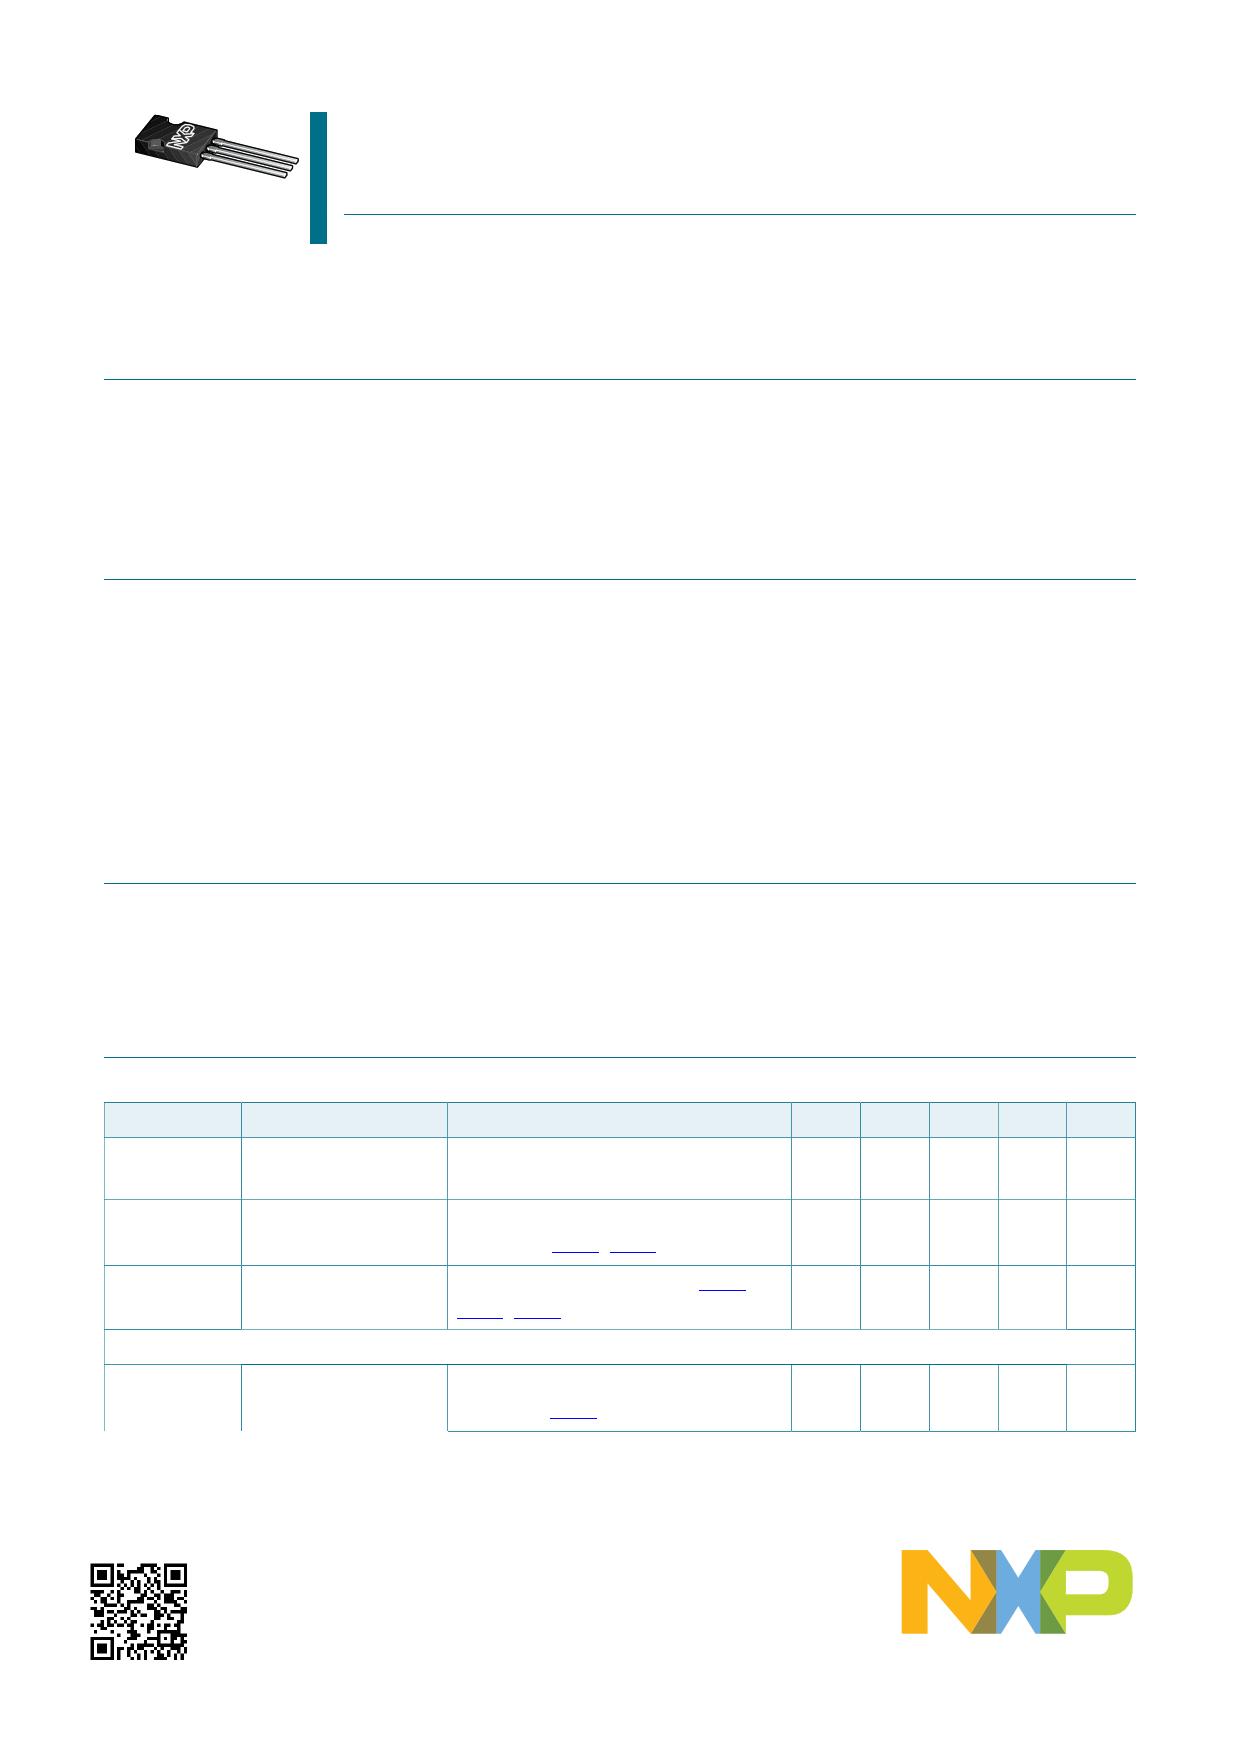 BT134-600E دیتاشیت PDF